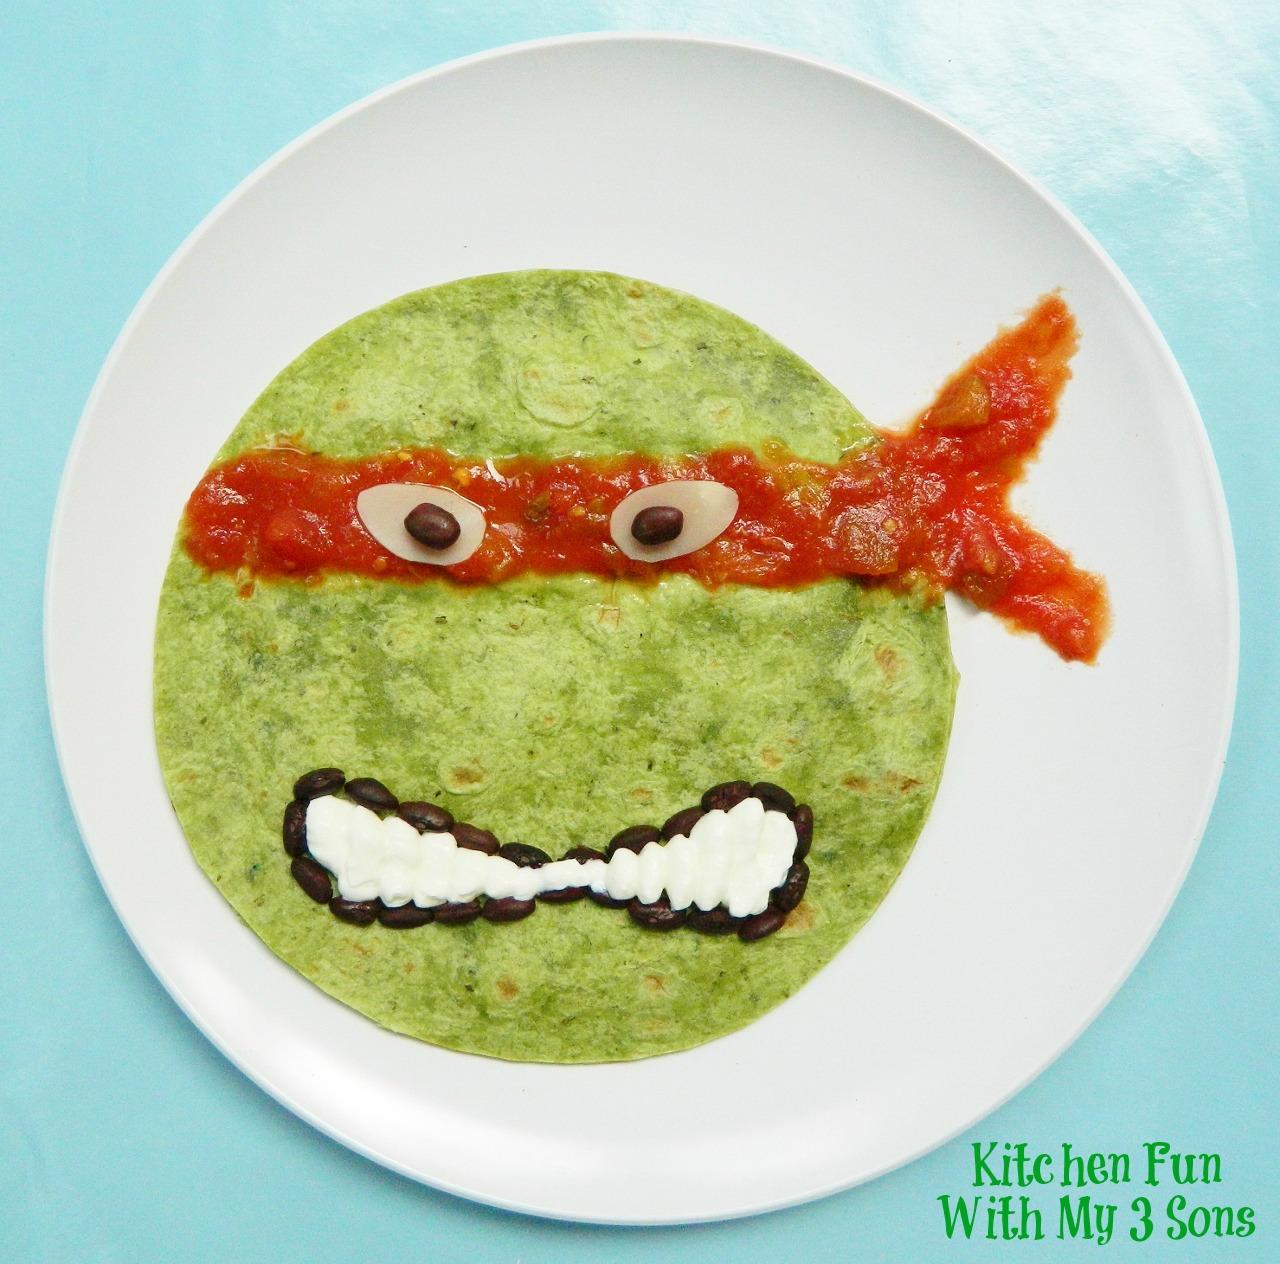 Kitchen Fun And Crafty Friday Link Party 167: Teenage Mutant Ninja Turtle Quesadilla Dinner